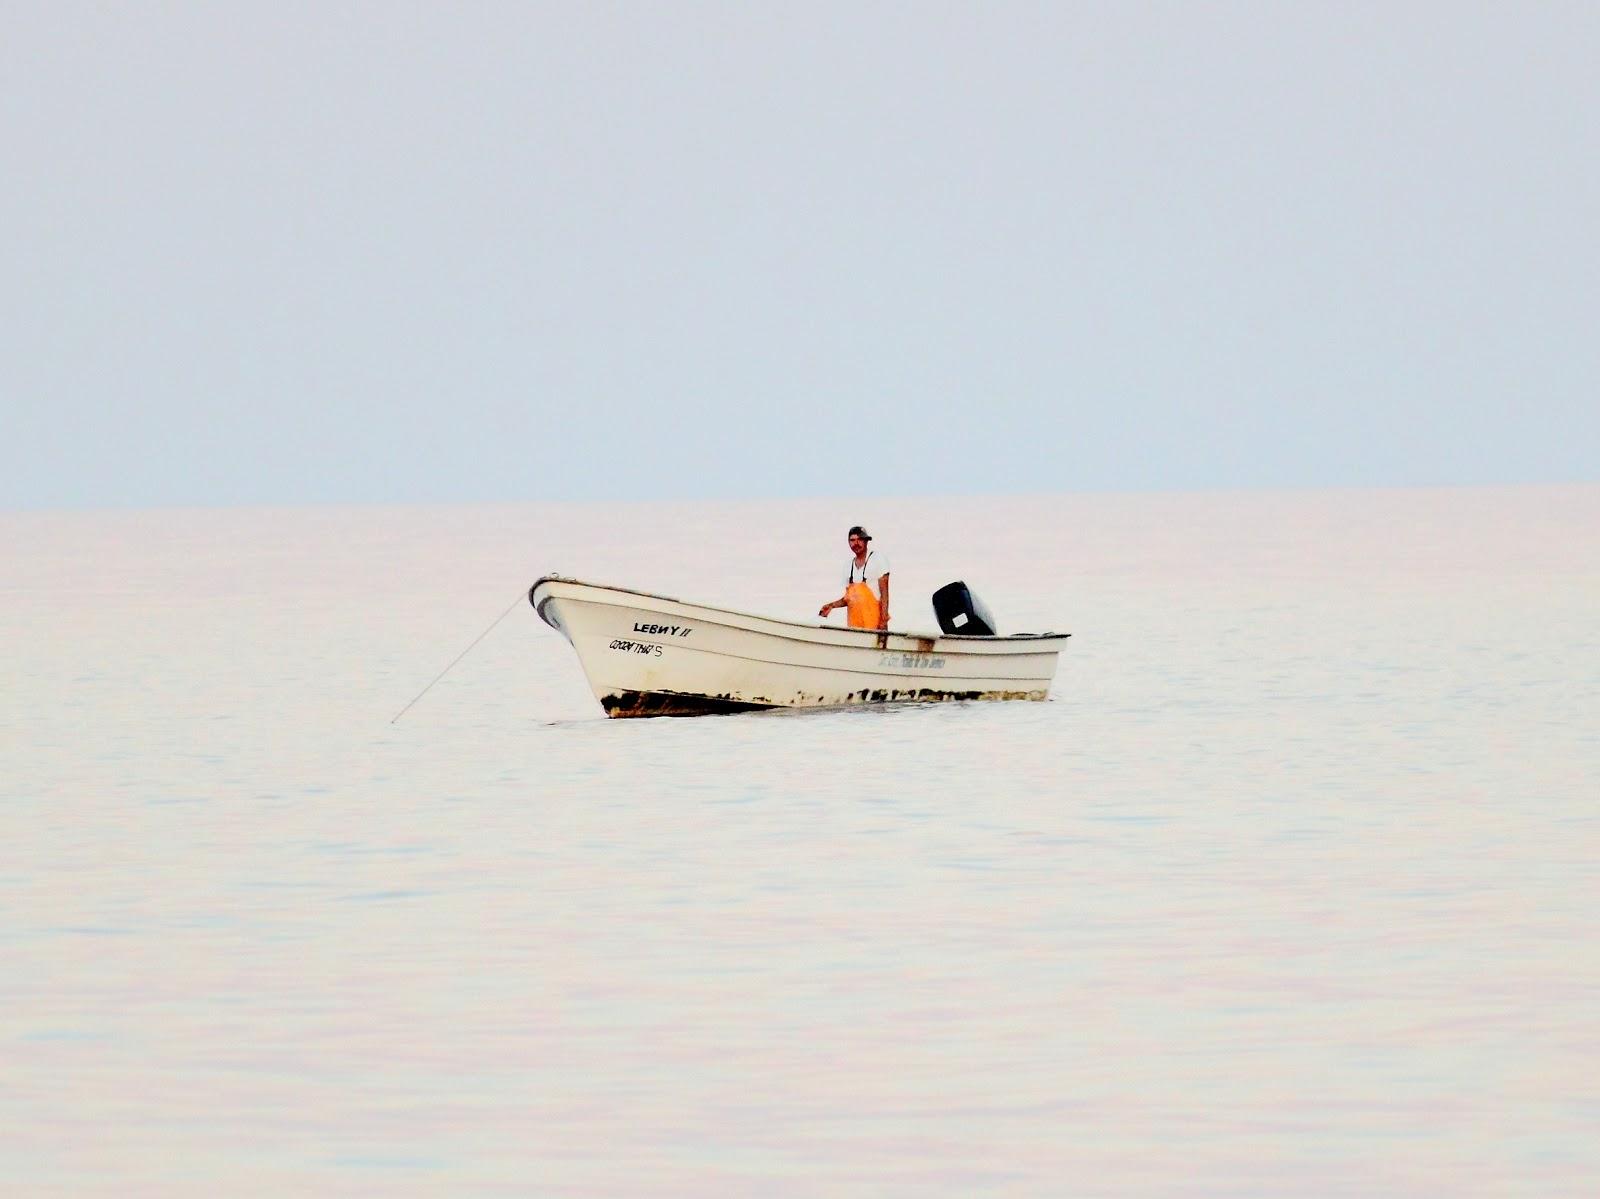 http://4.bp.blogspot.com/-8tvPKNX9B8o/T61RCchMcGI/AAAAAAAAChQ/TYQIAkKY-cw/s1600/fisher.JPG